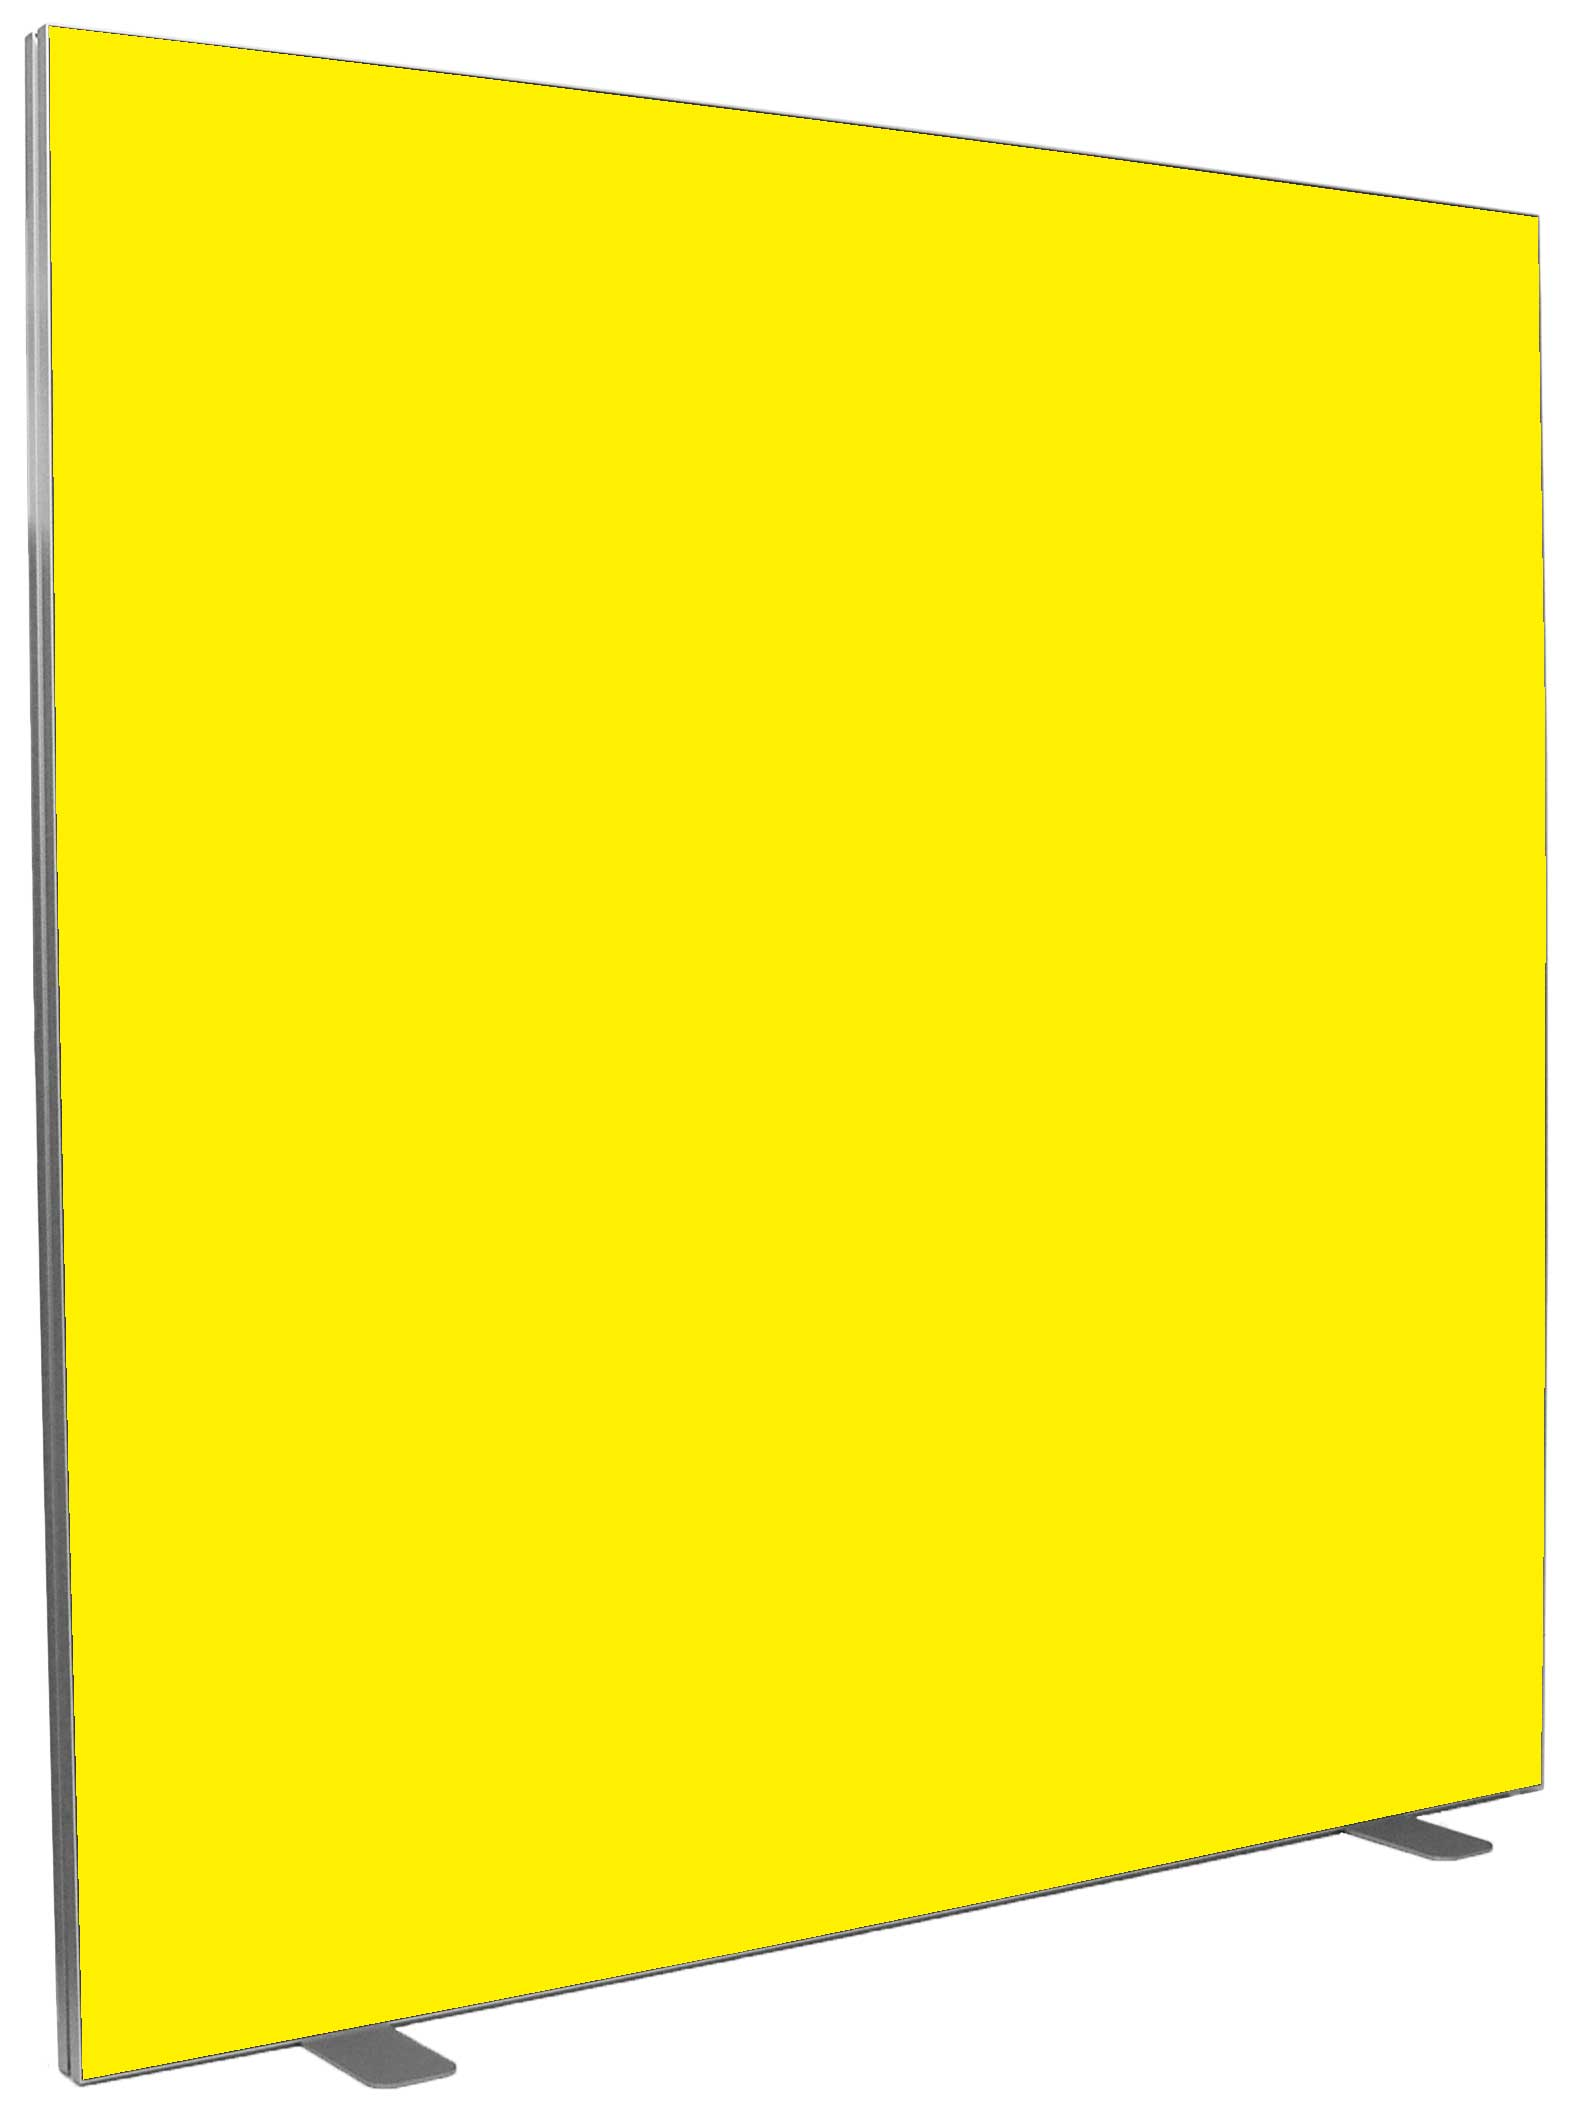 Stellwand Zitrone 008